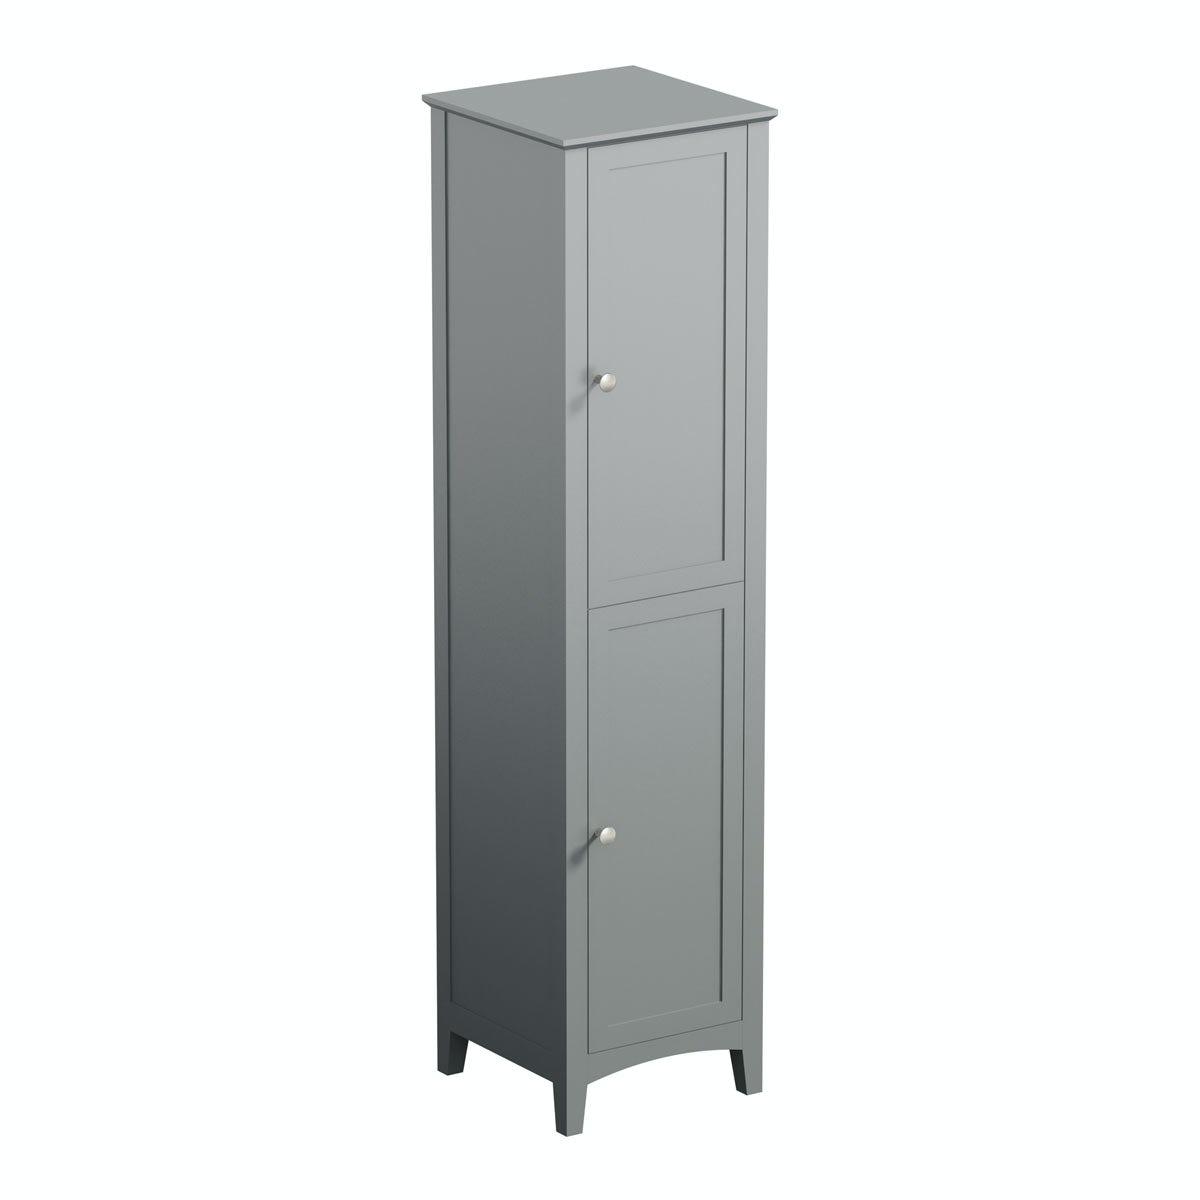 The Bath Co. Camberley satin grey tall storage unit